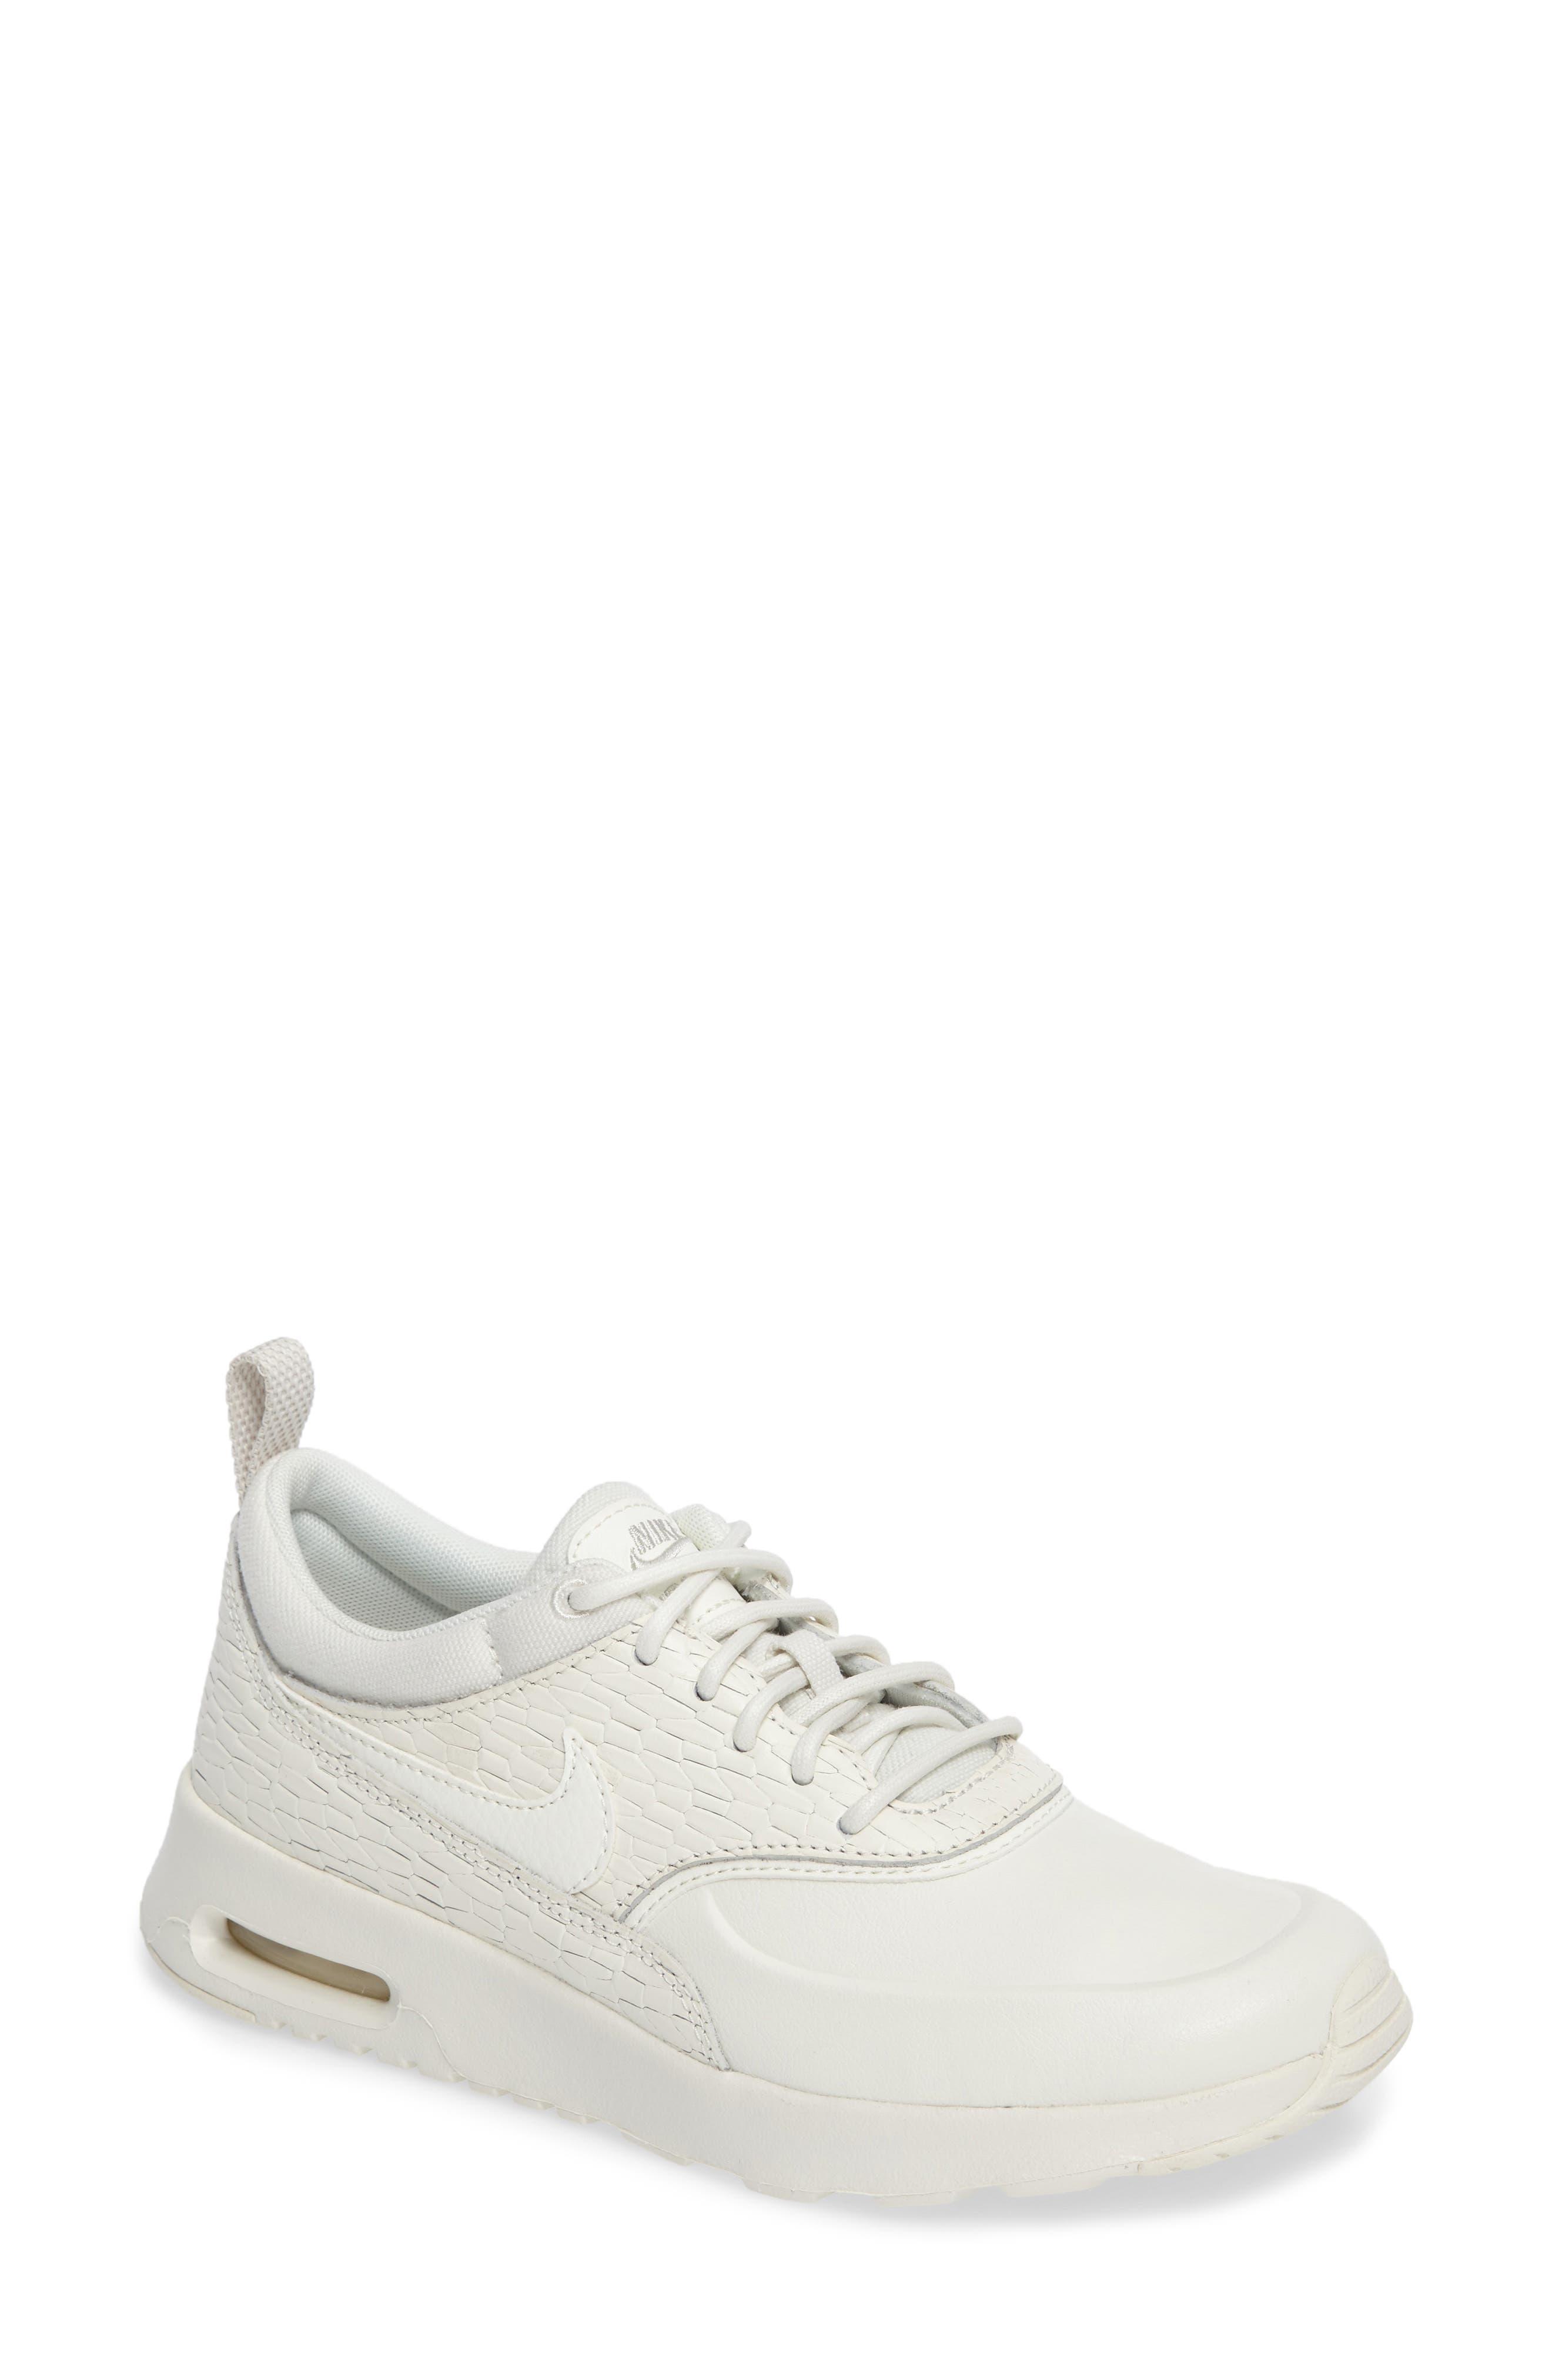 Air Max Thea Premium Sneaker,                             Main thumbnail 3, color,